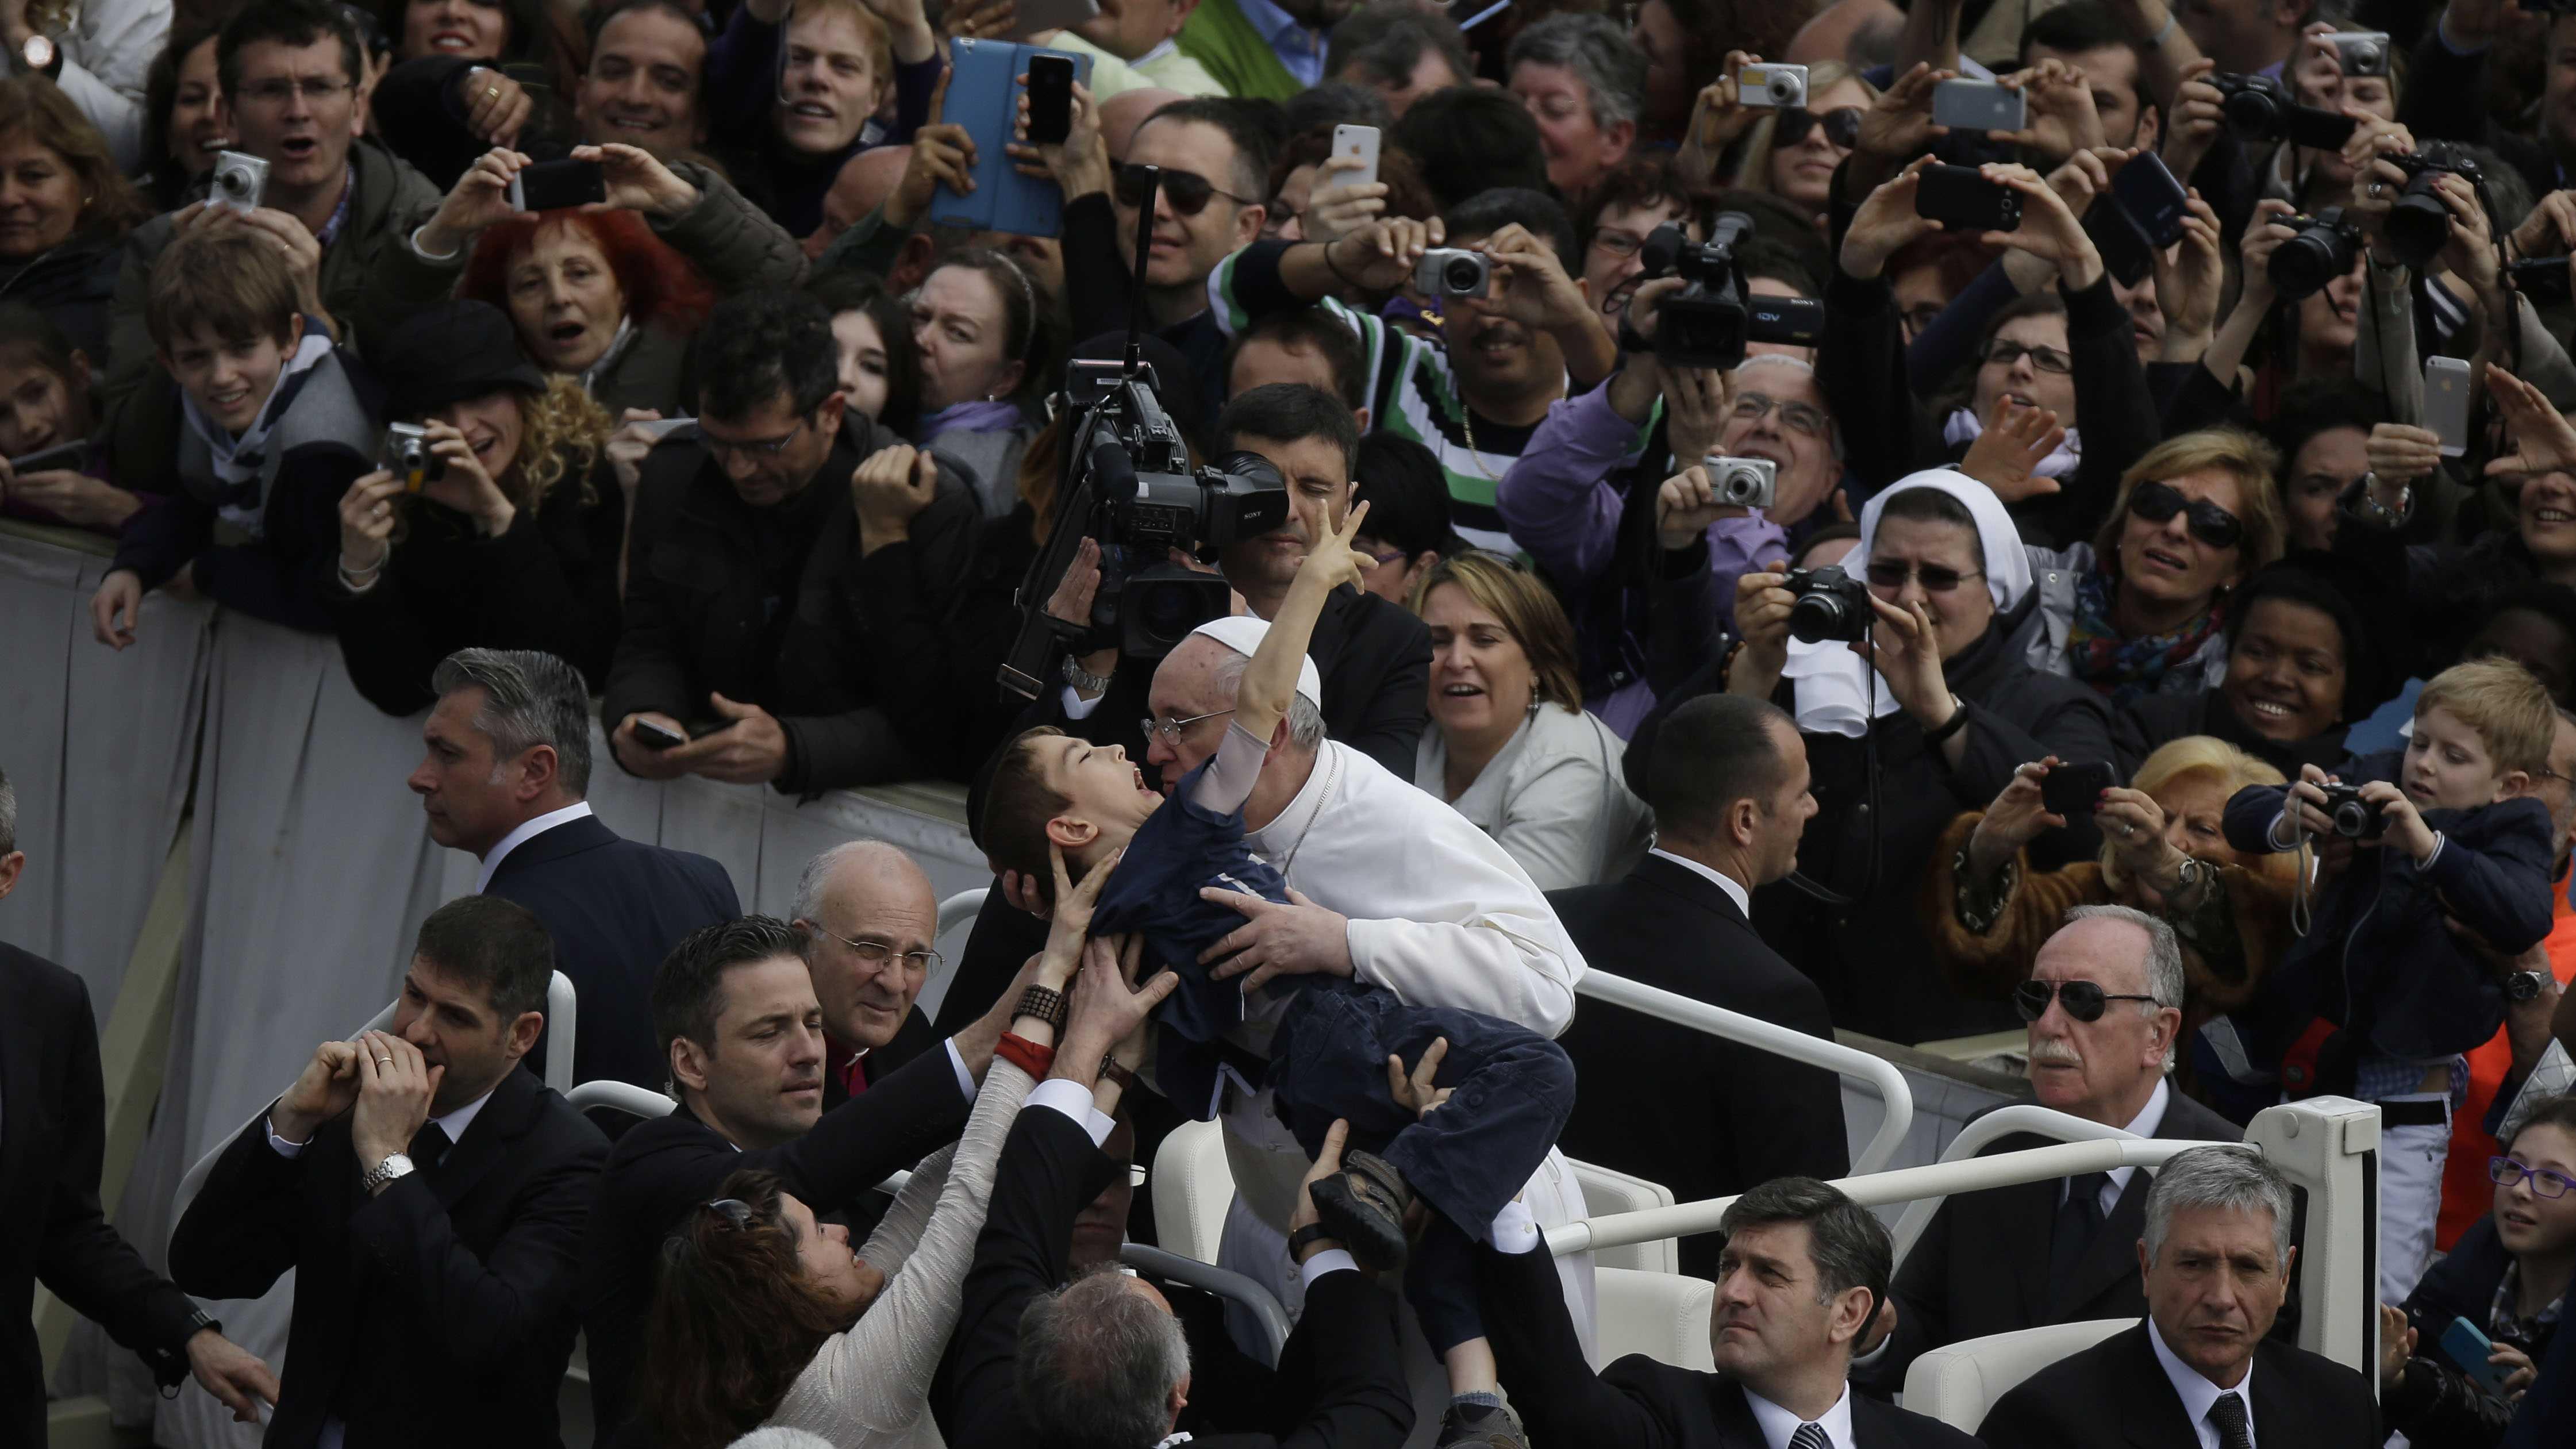 Pope Picks up Rhode Island Boy